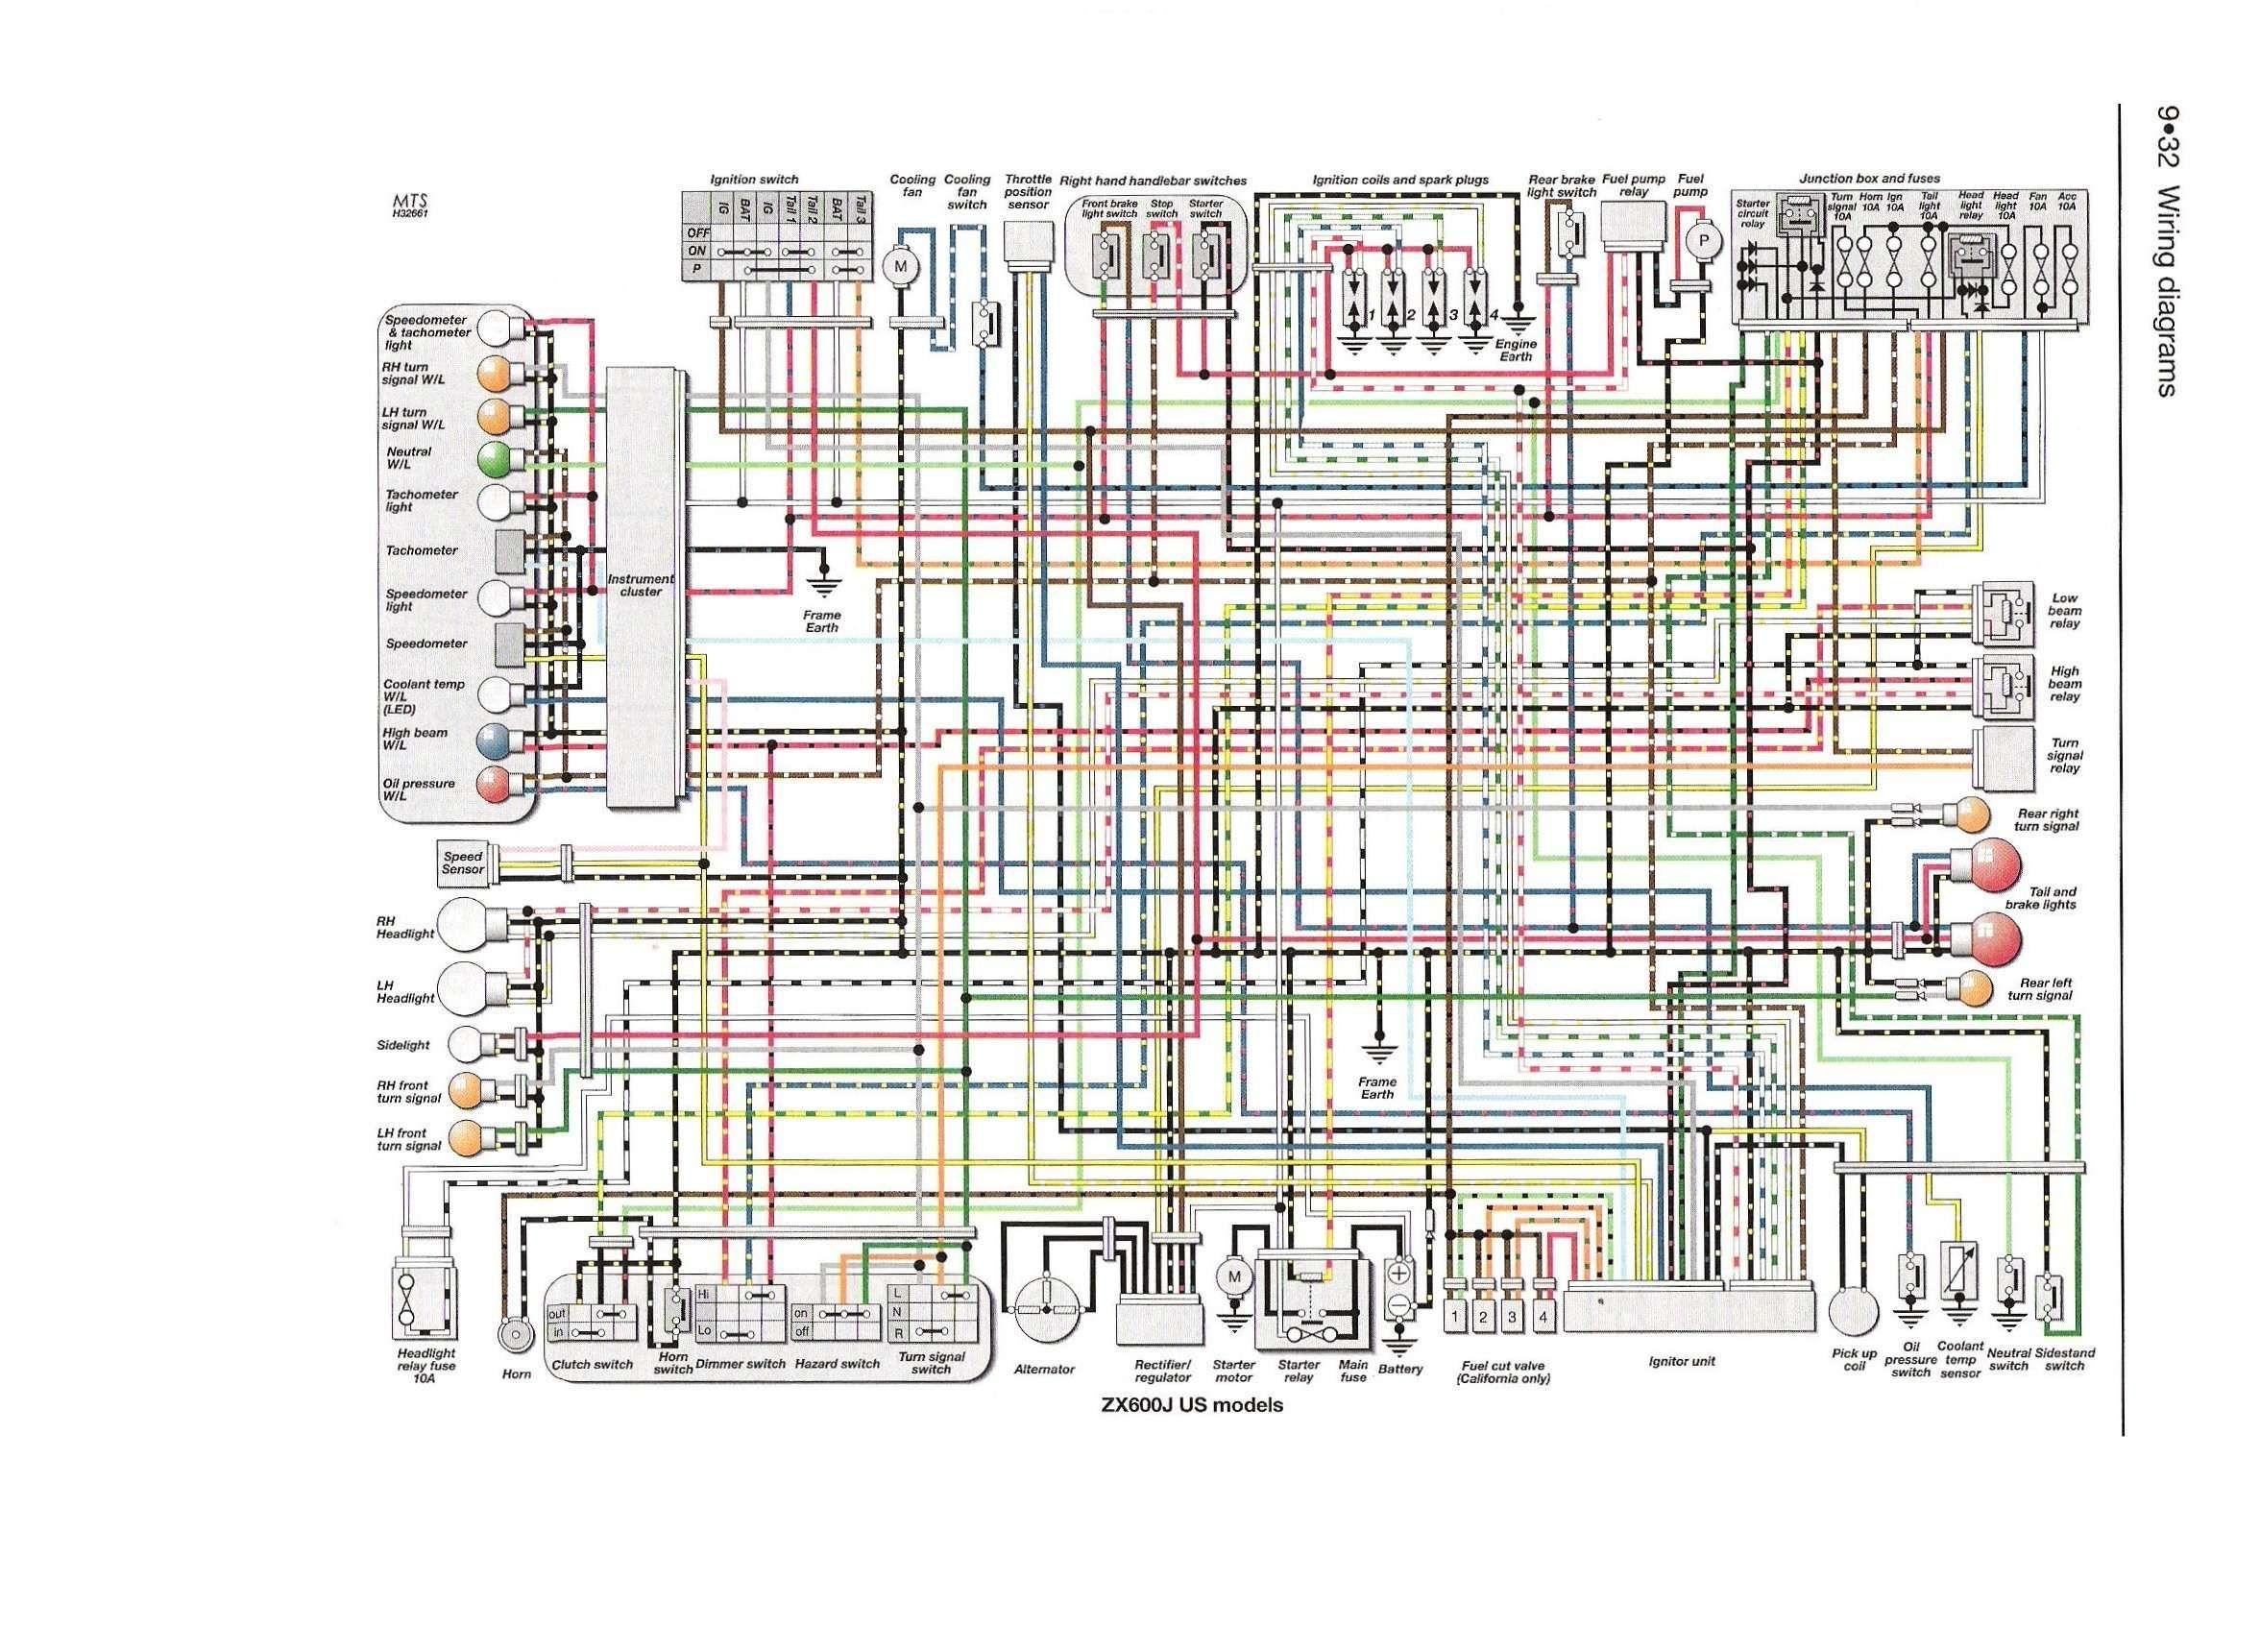 Strange Zx6R G1 Wiring Diagram Basic Electronics Wiring Diagram Wiring Cloud Ittabisraaidewilluminateatxorg